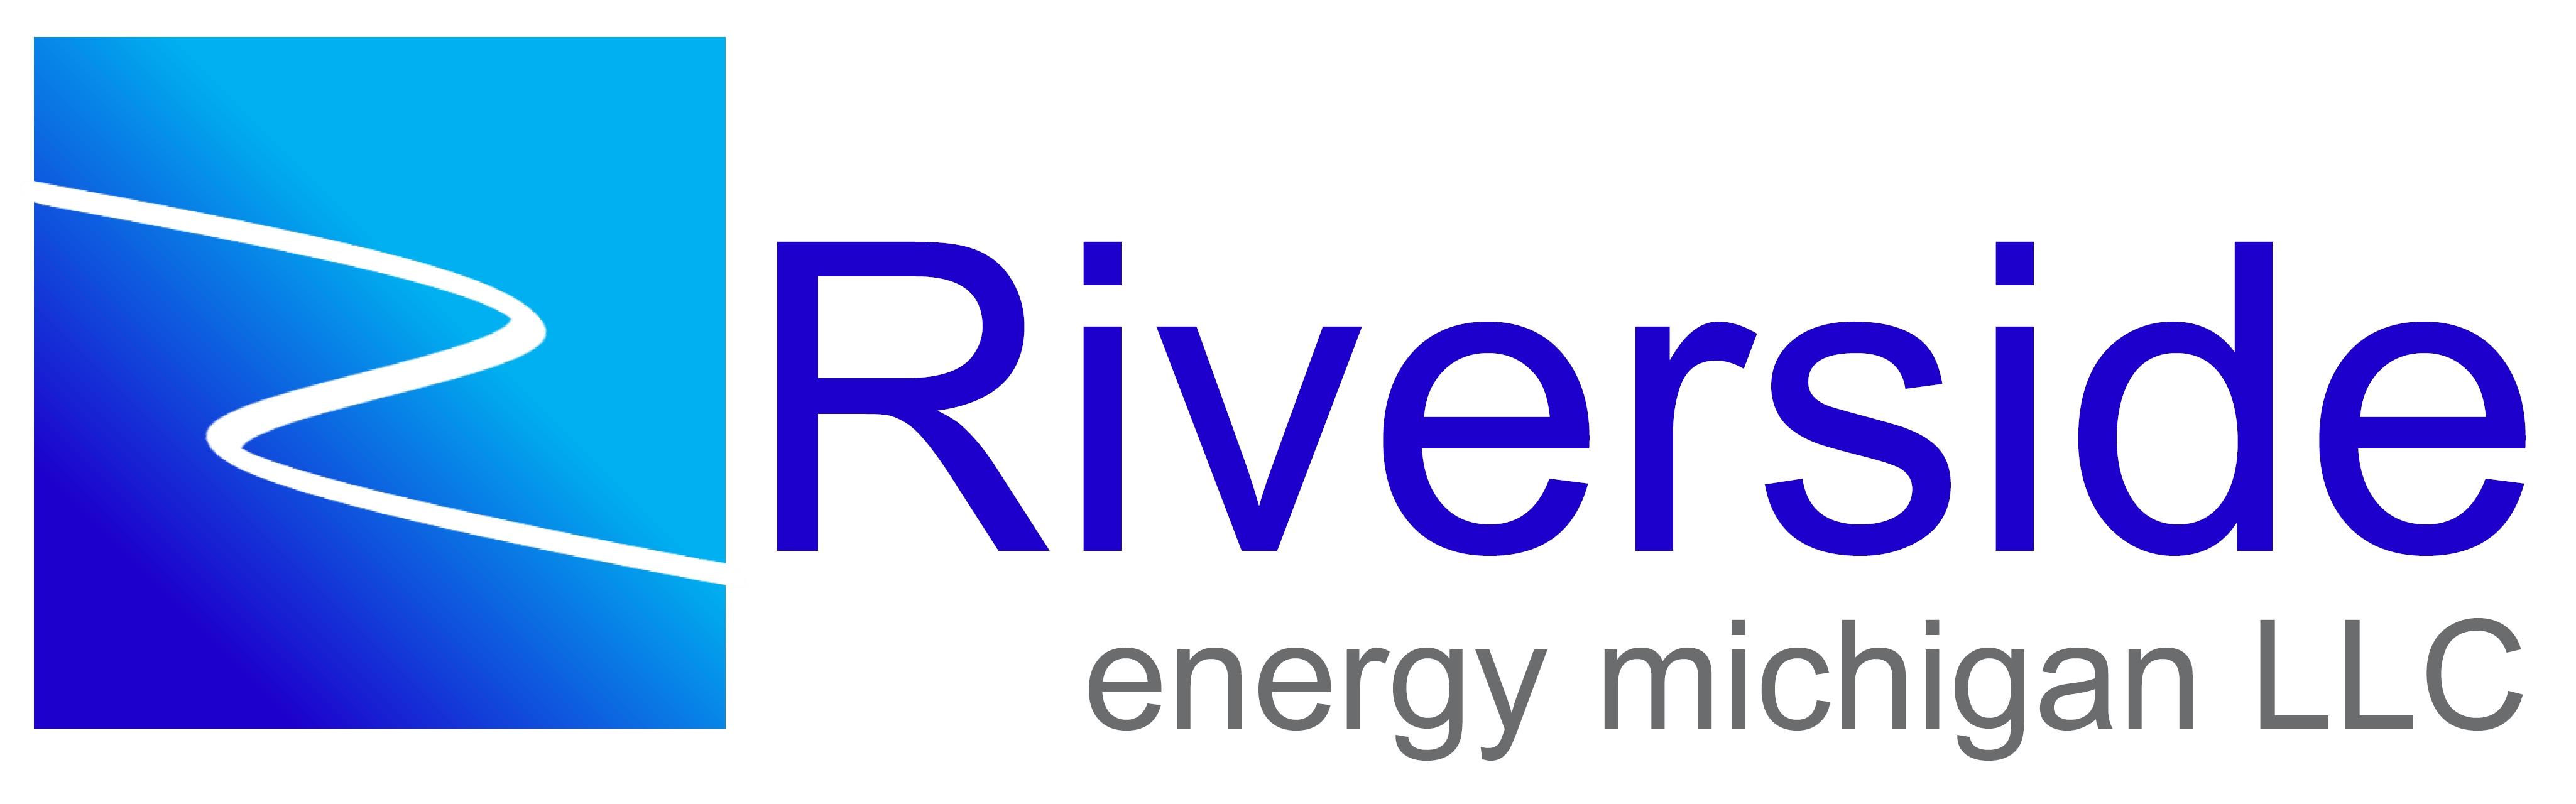 Riverside_Energy_Michigan_Logo_(2).jpg